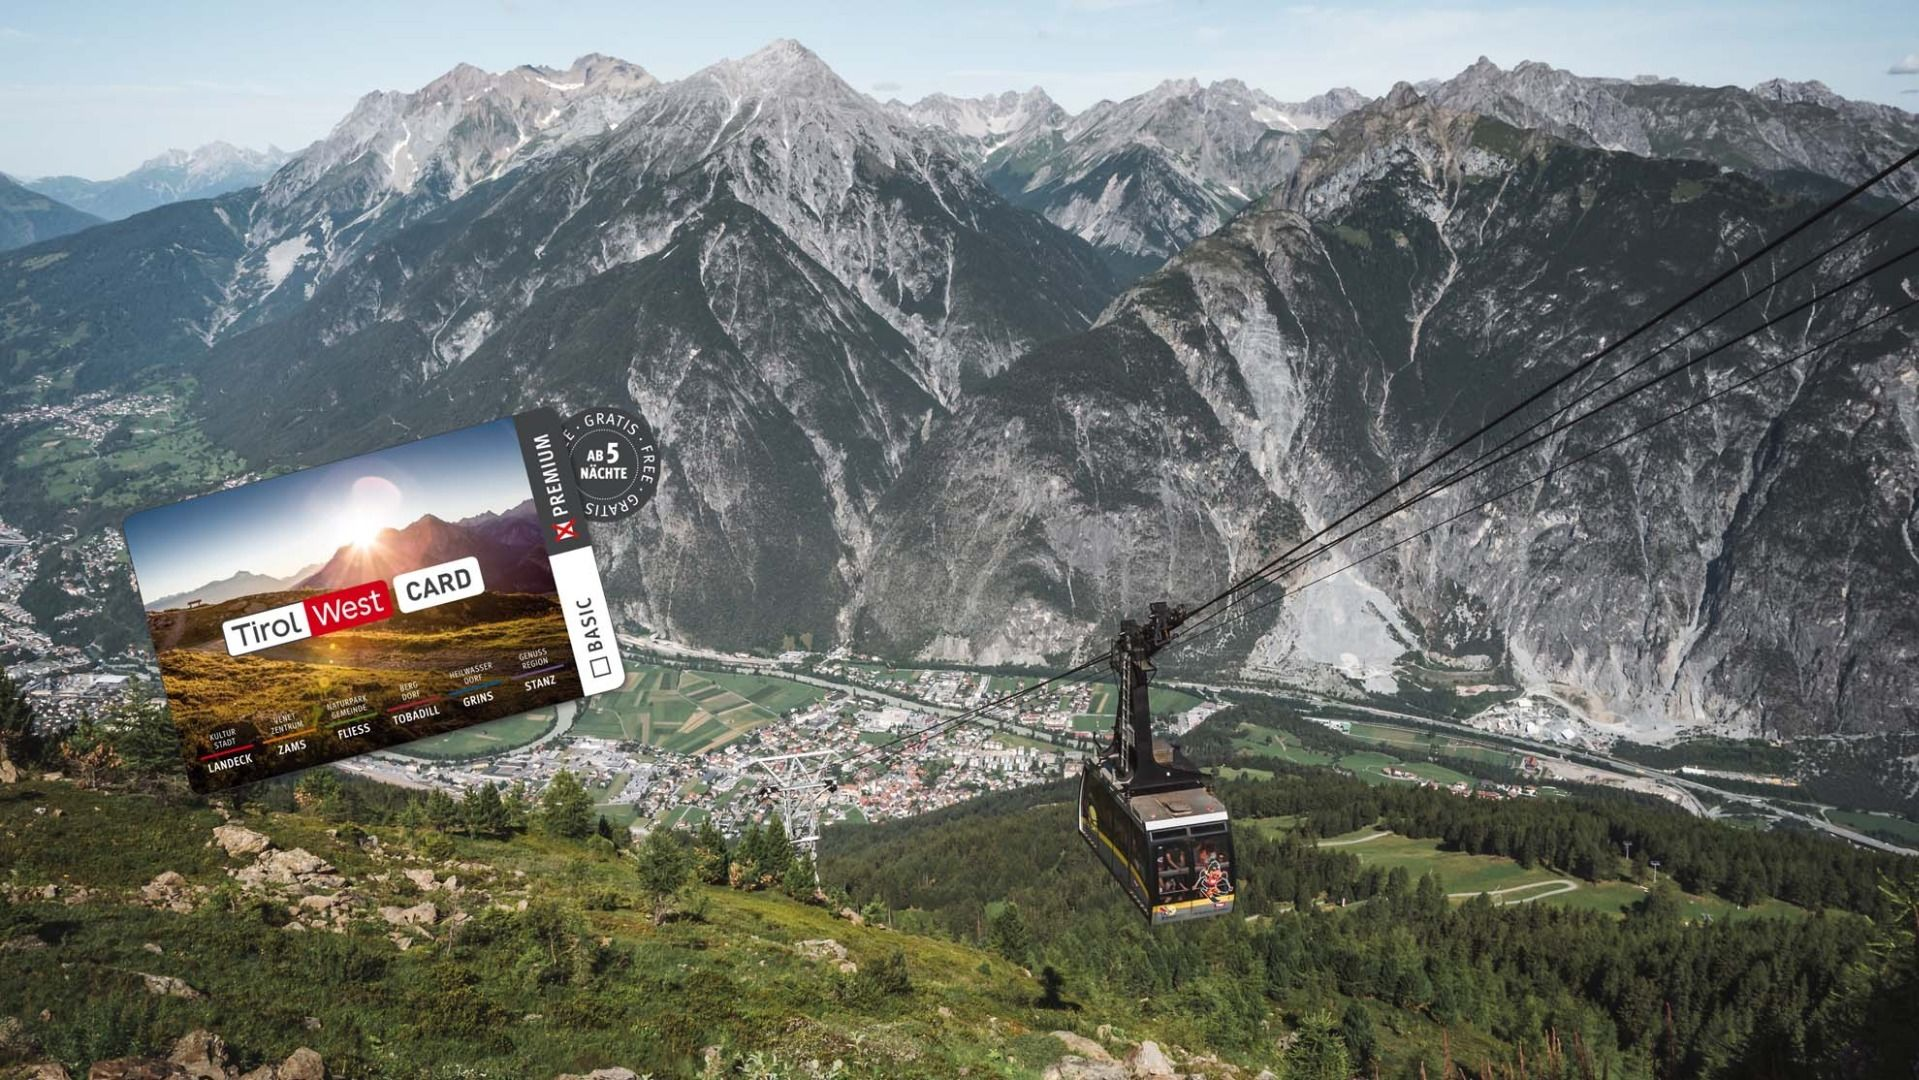 TirolWest Card Premium